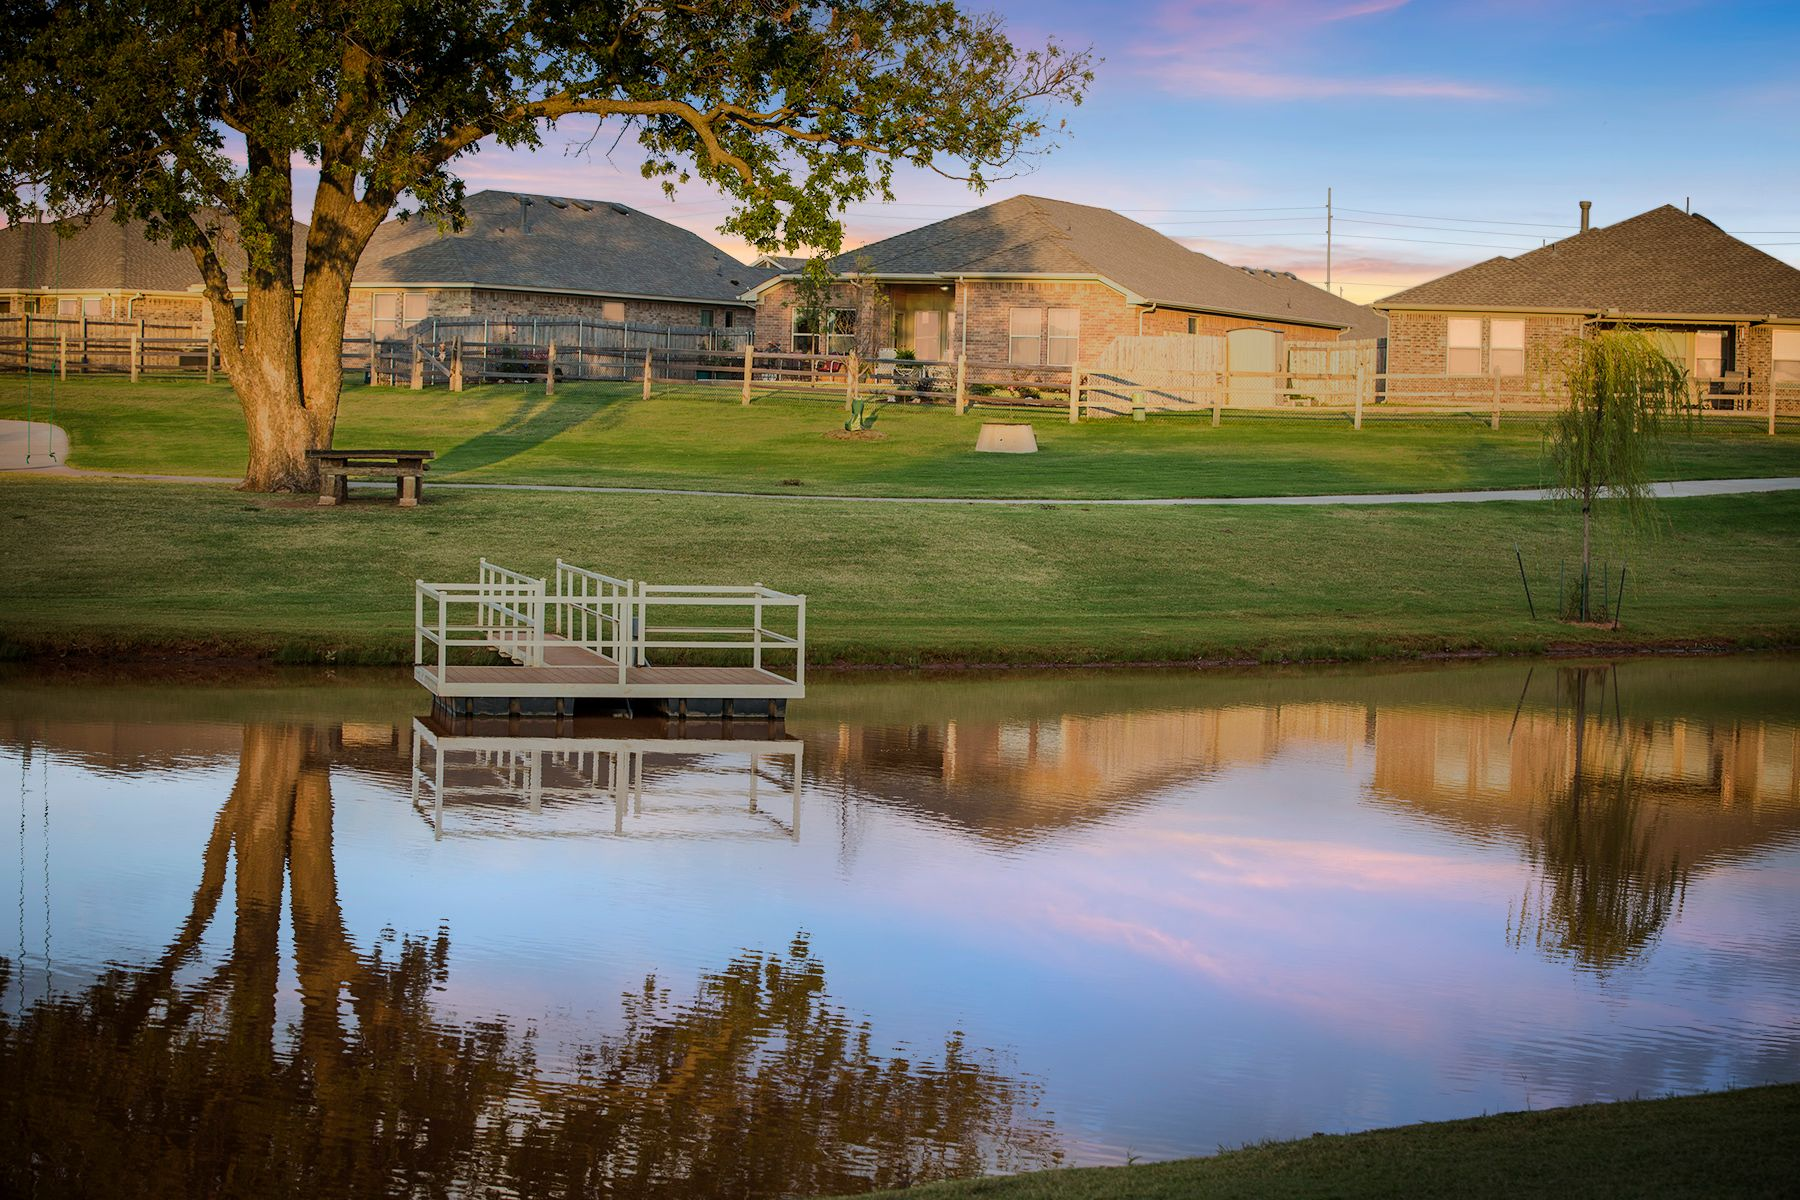 Pond in an Ideal neighborhood